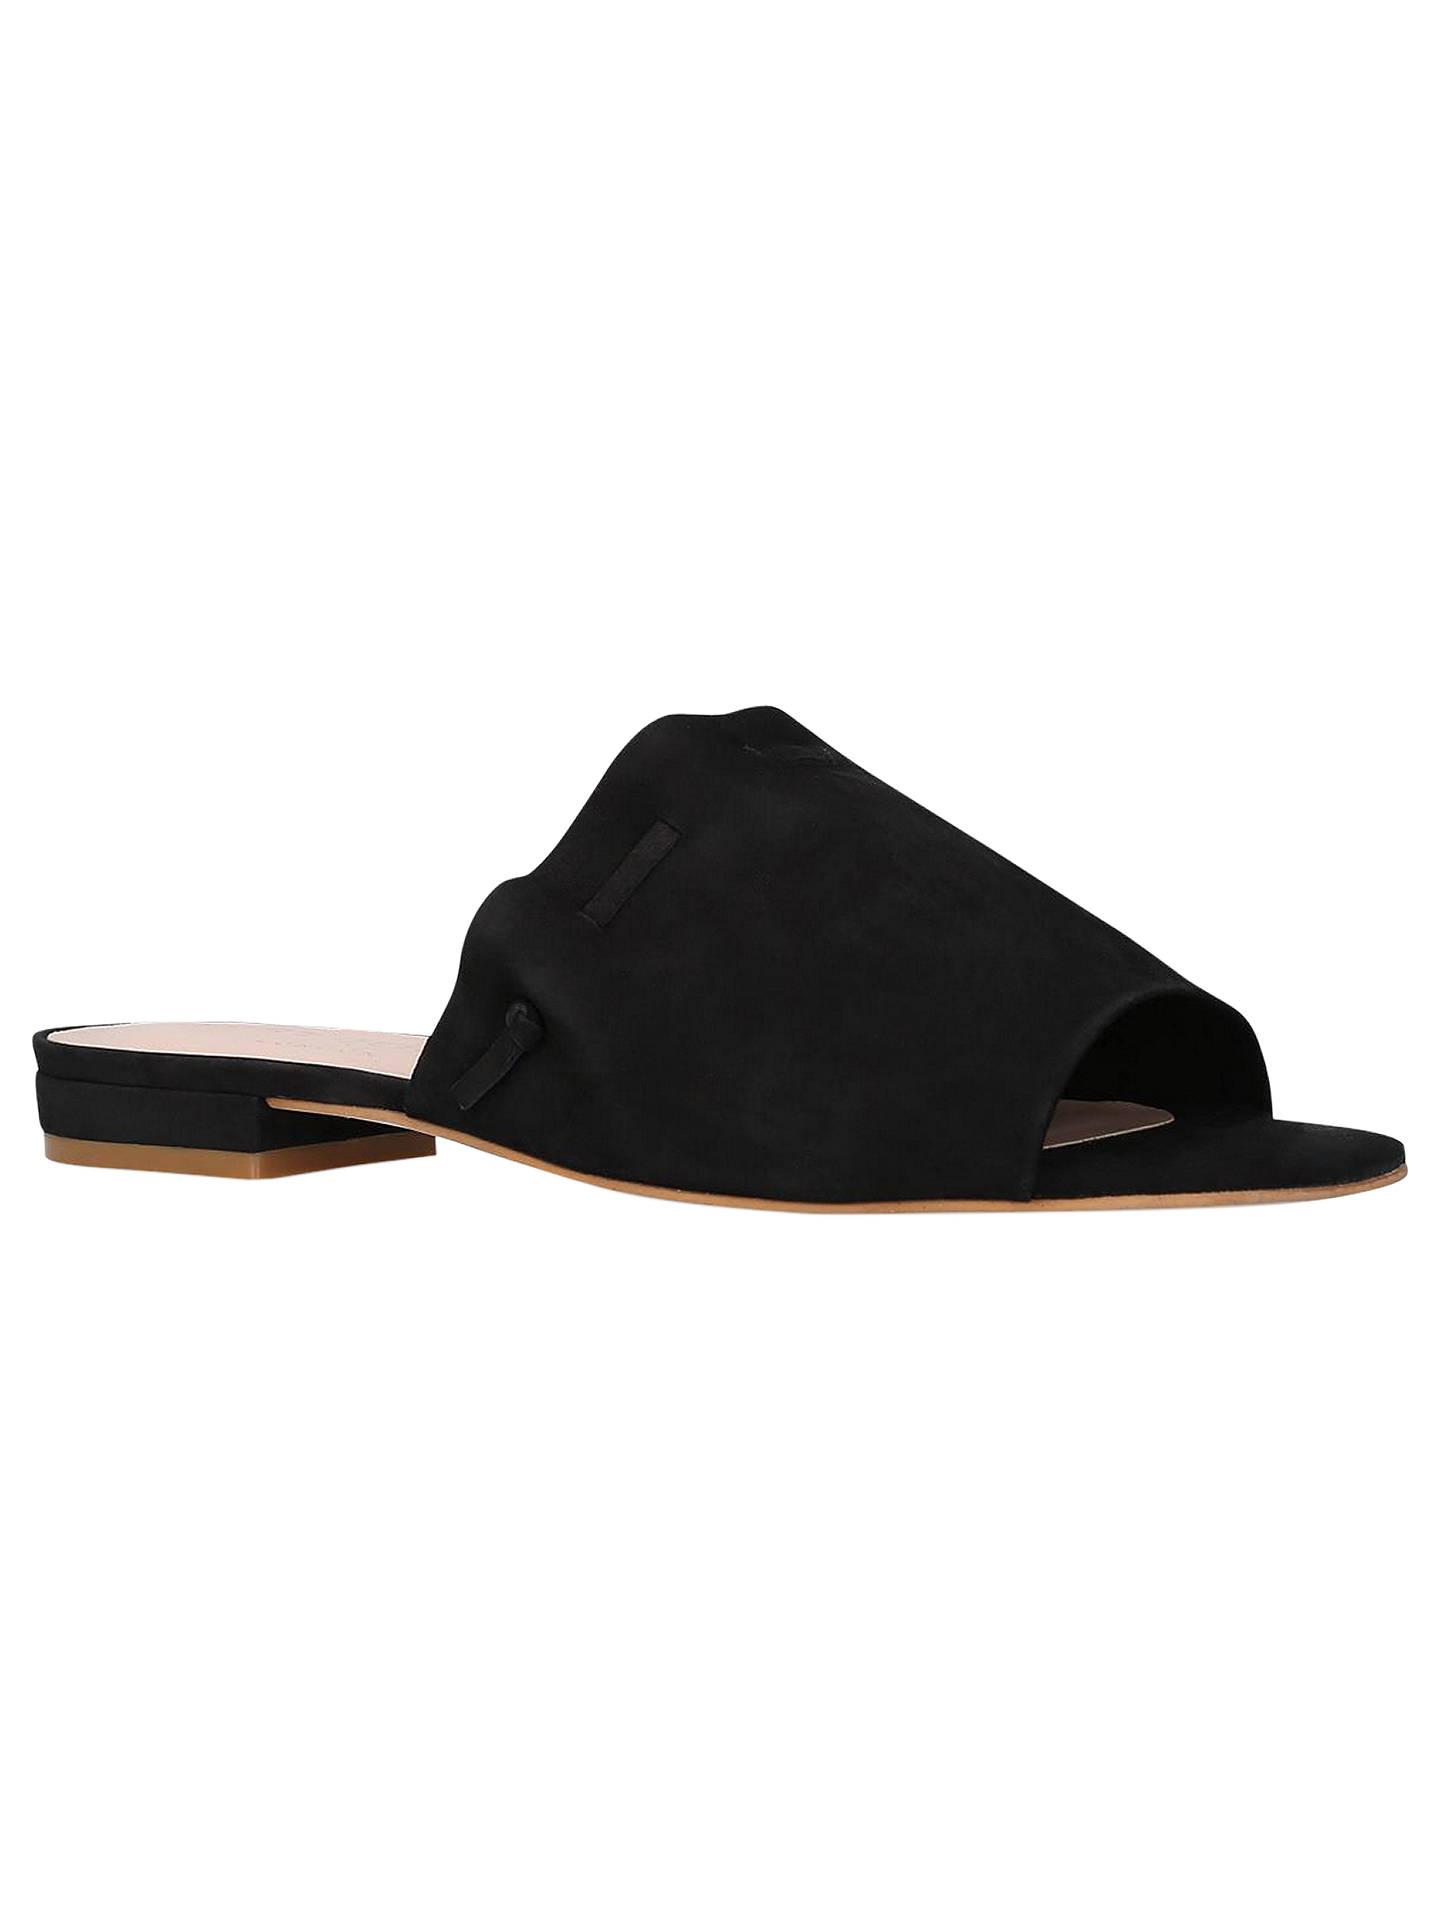 464d471e093 Kurt Geiger Opal Leather Mules, Black at John Lewis & Partners